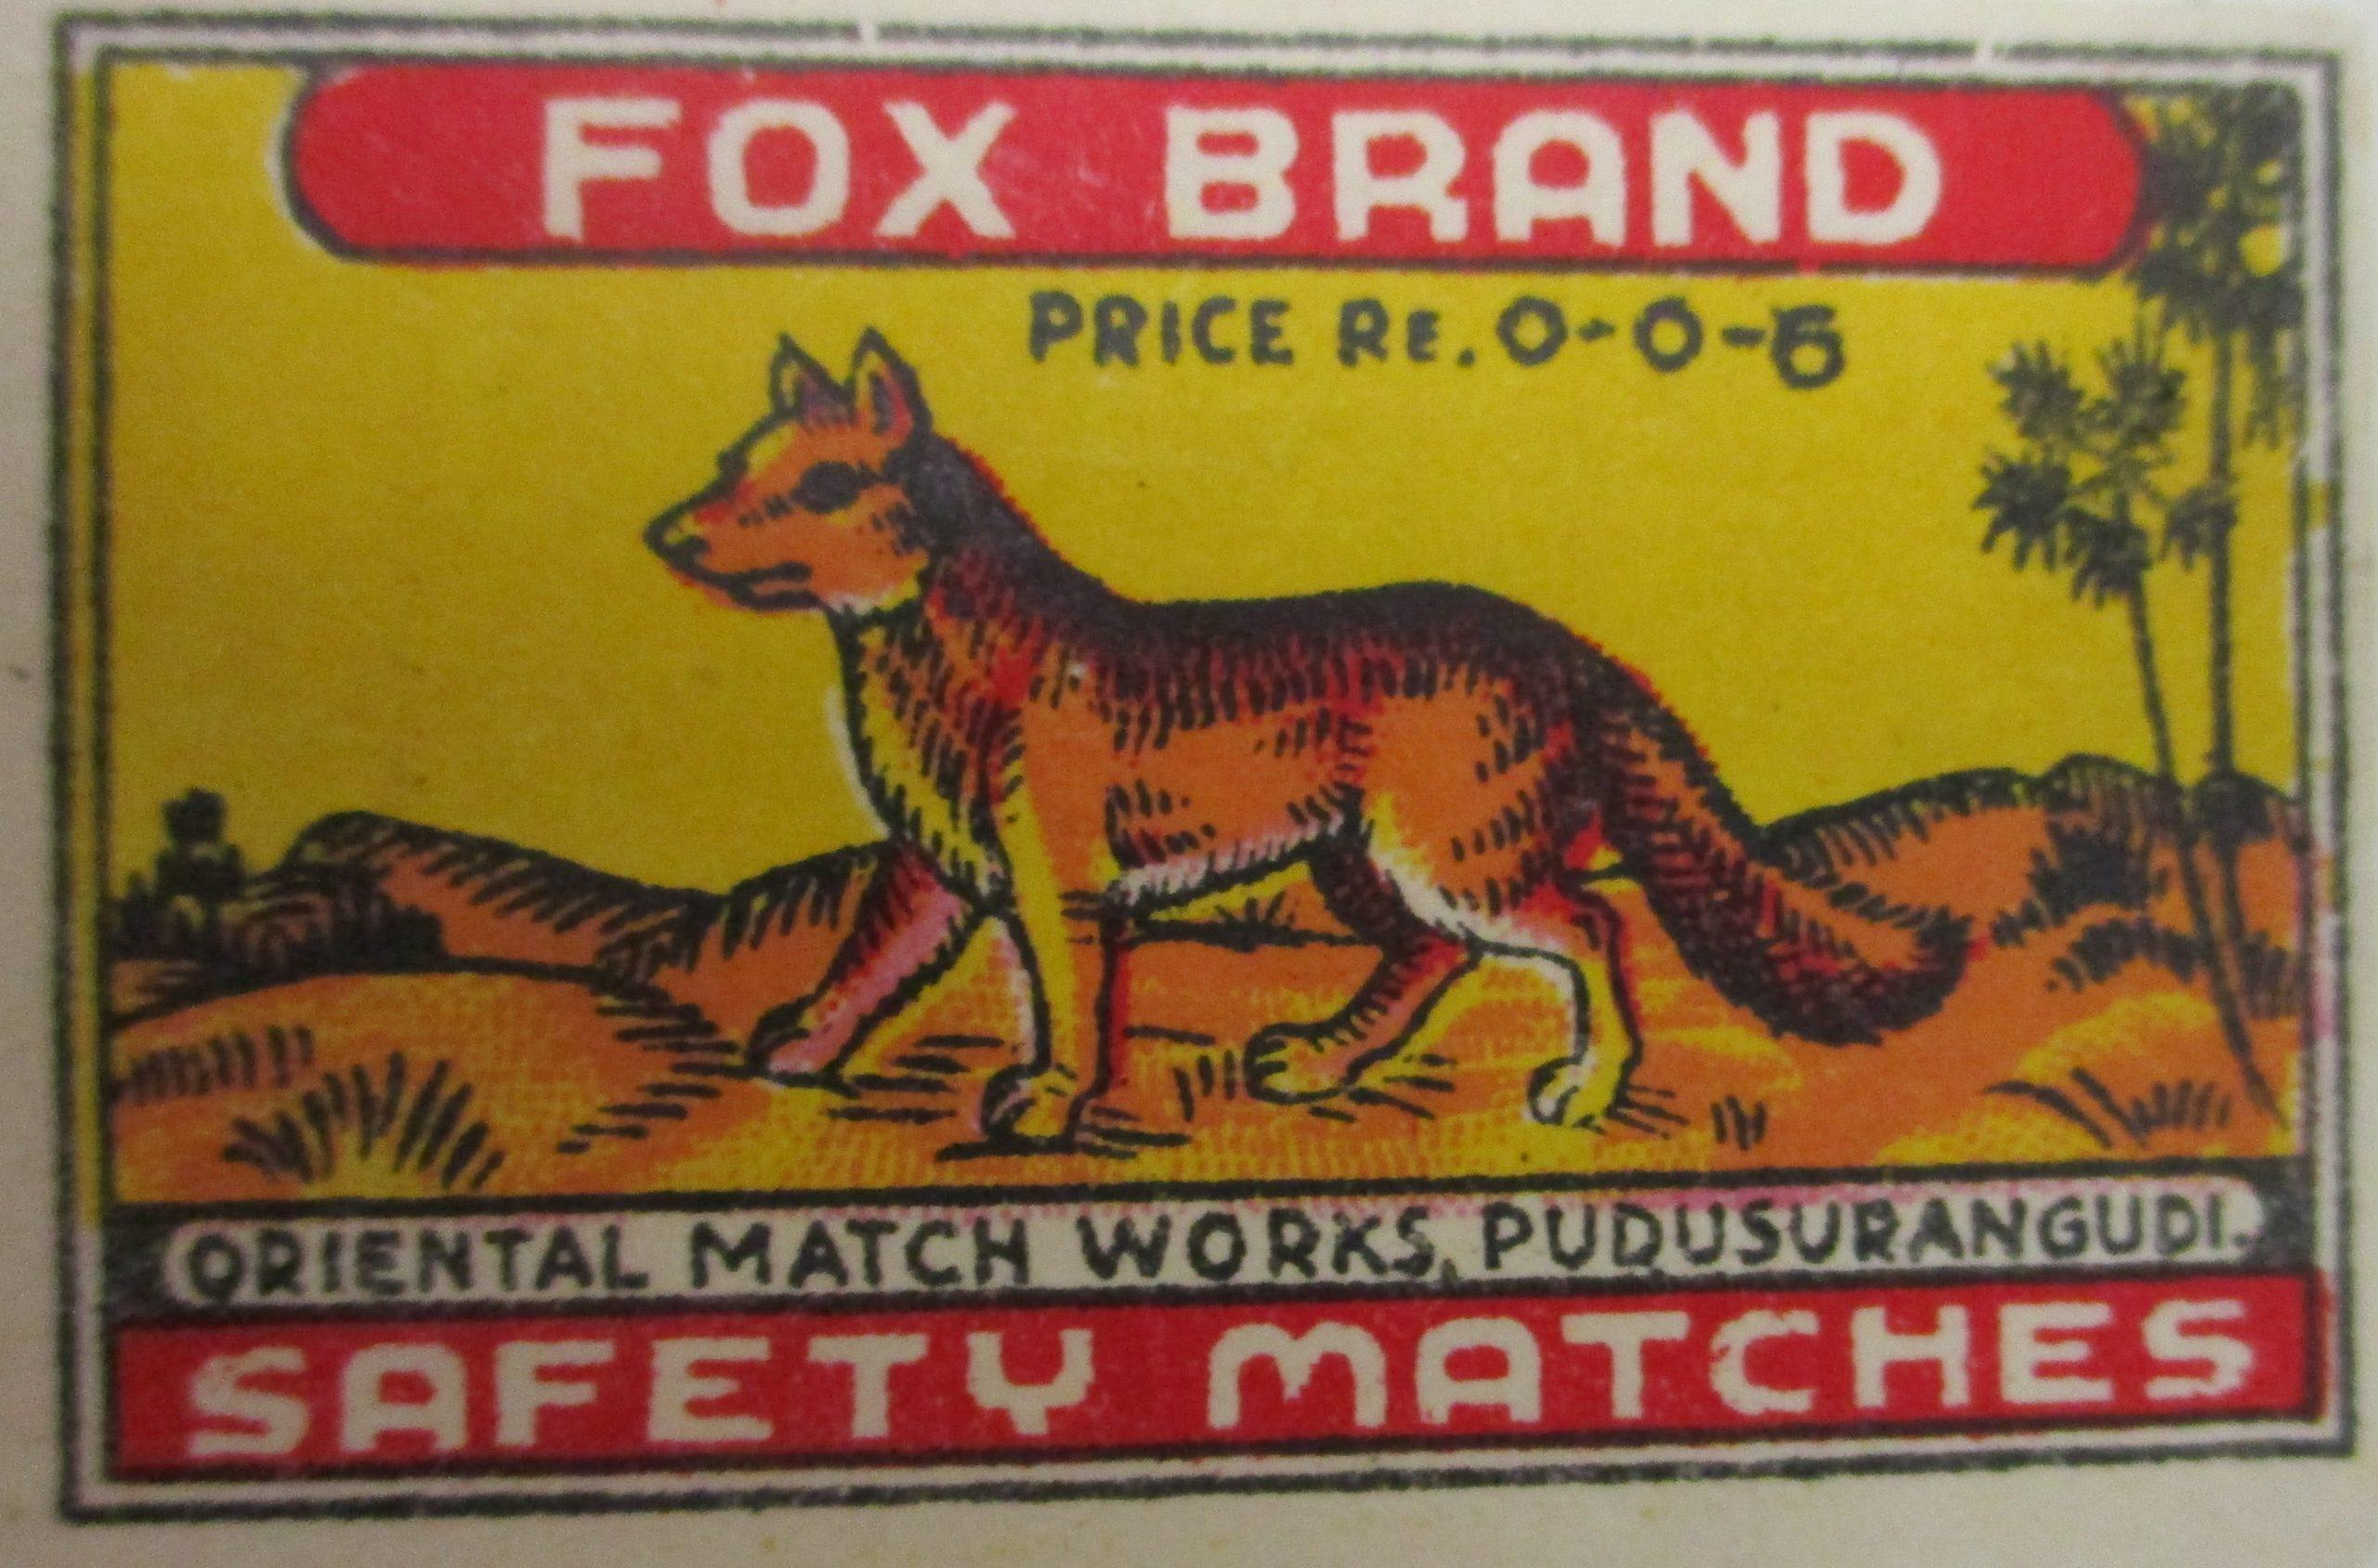 Indian matchbox label 52 mm x 36 mm ca. 1970